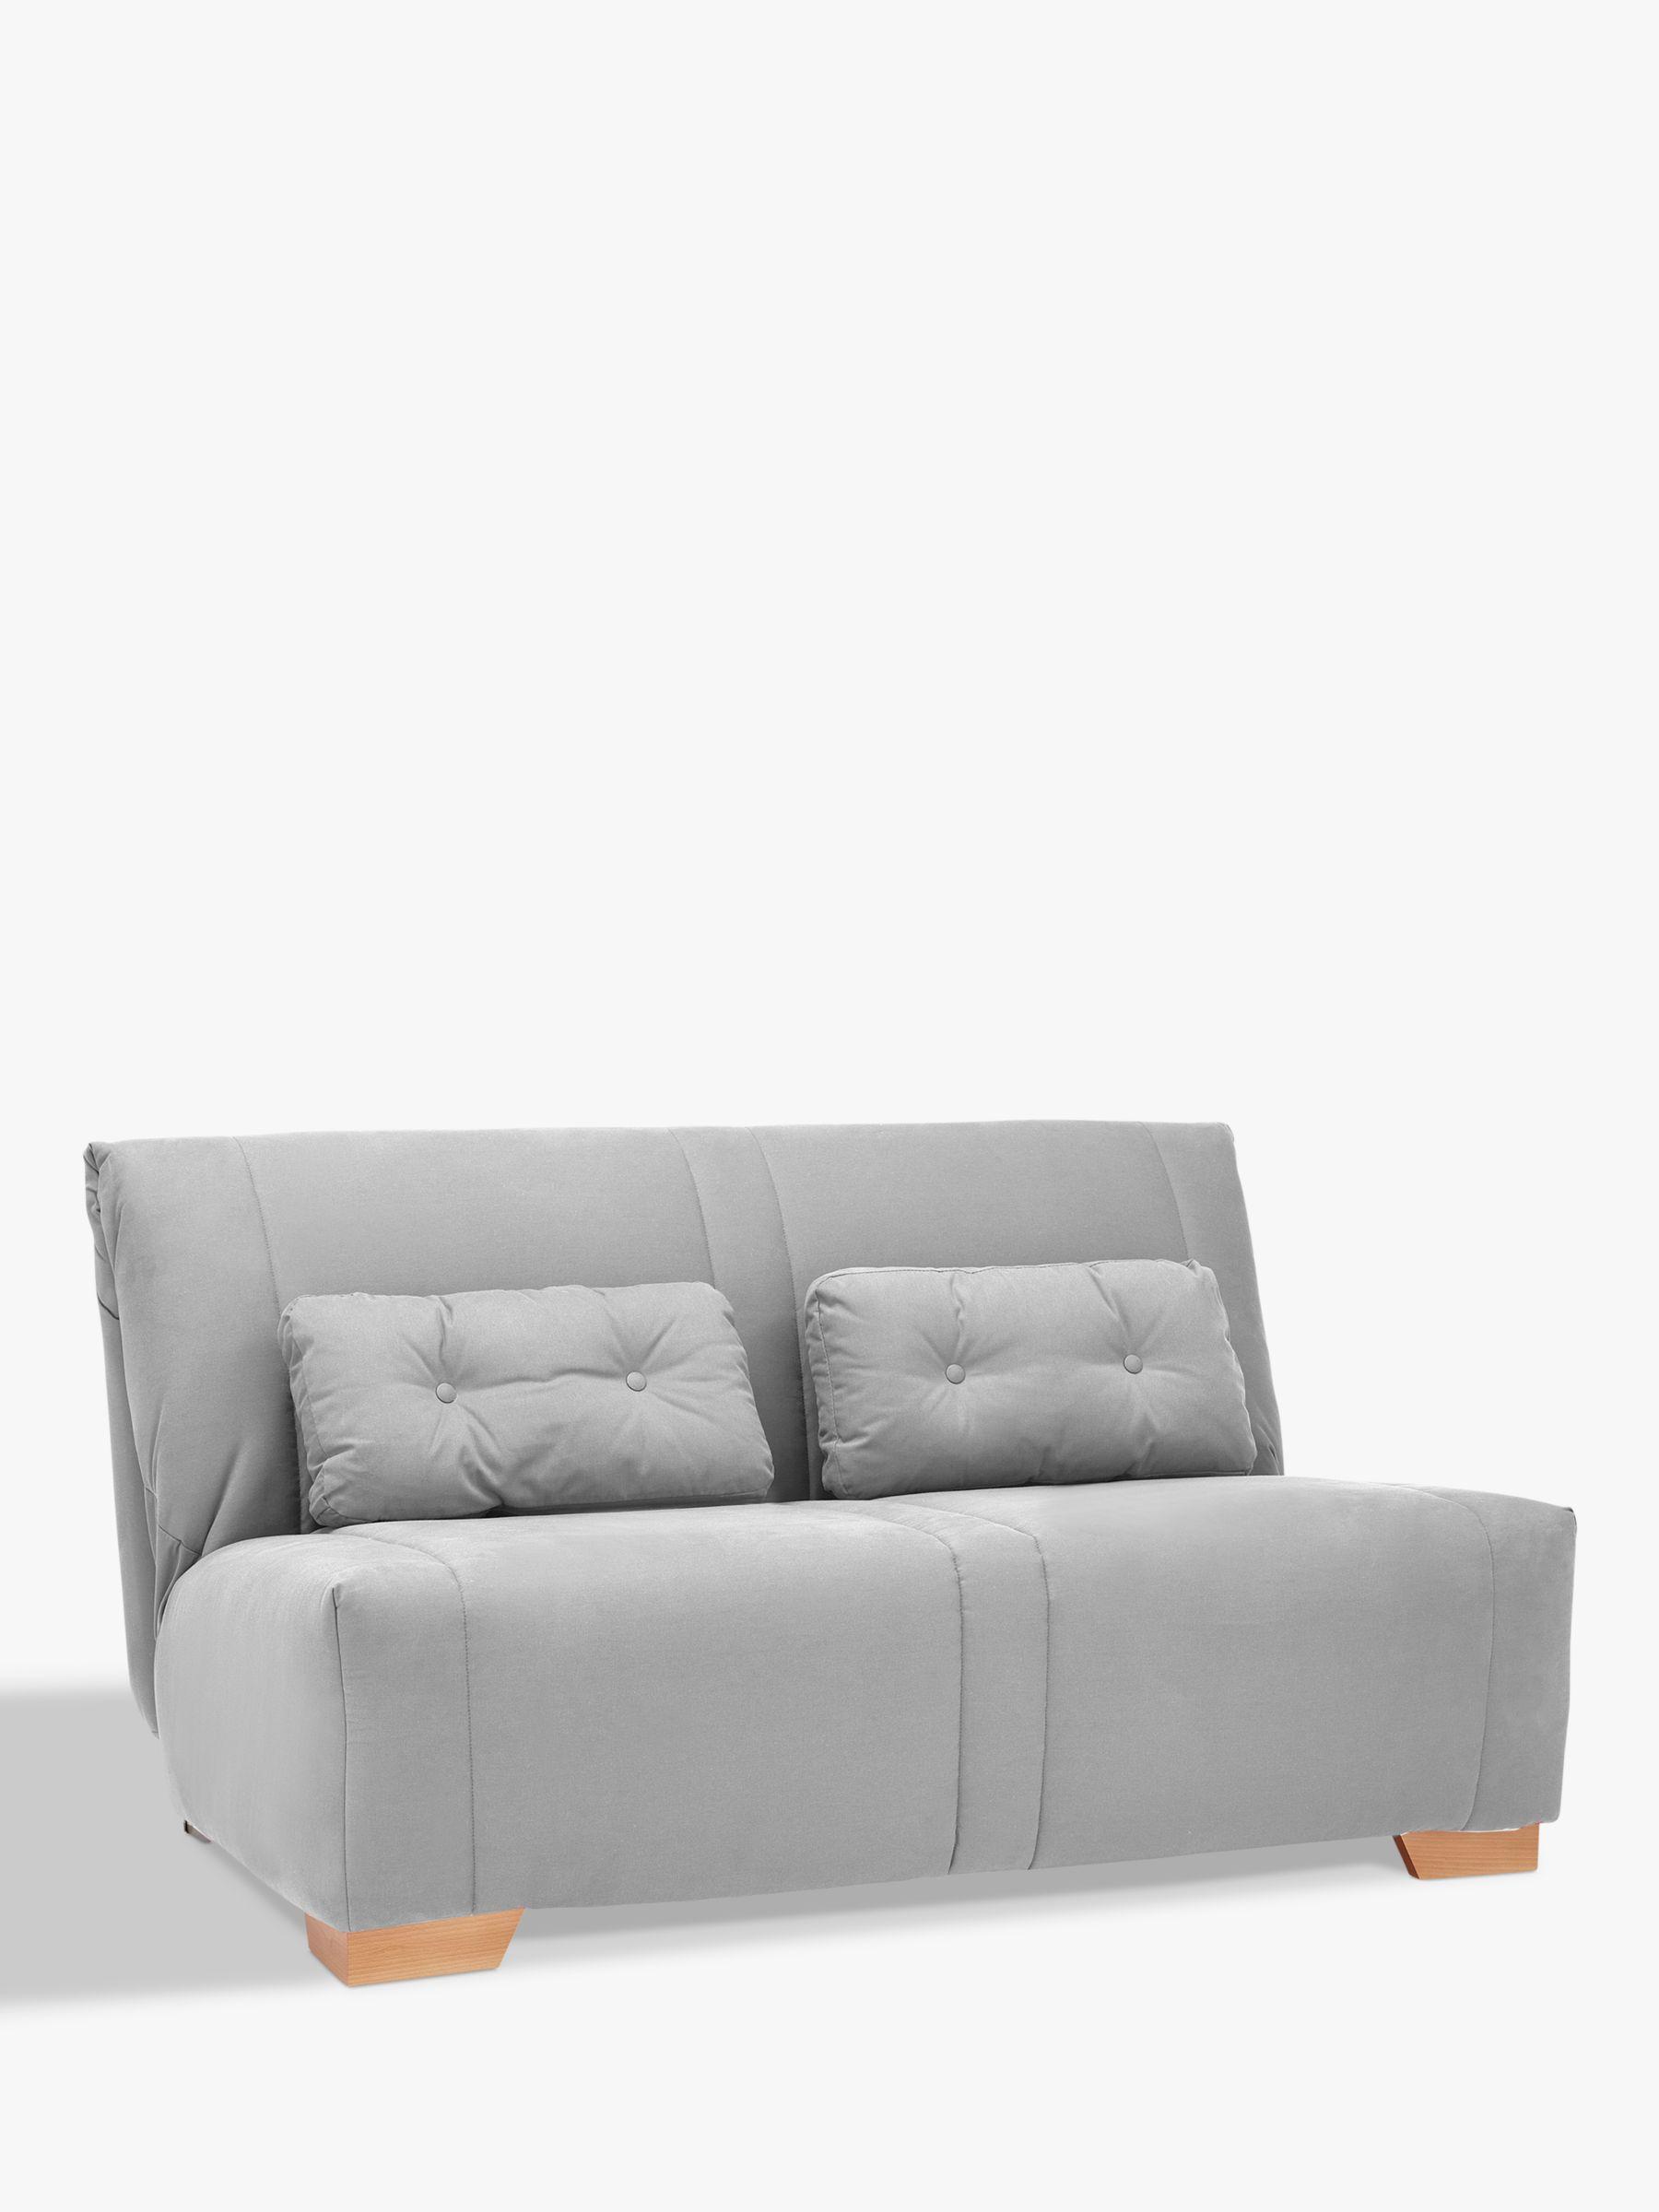 John Lewis Amp Partners Swoon Lyon Medium 2 Seater Sofa Review